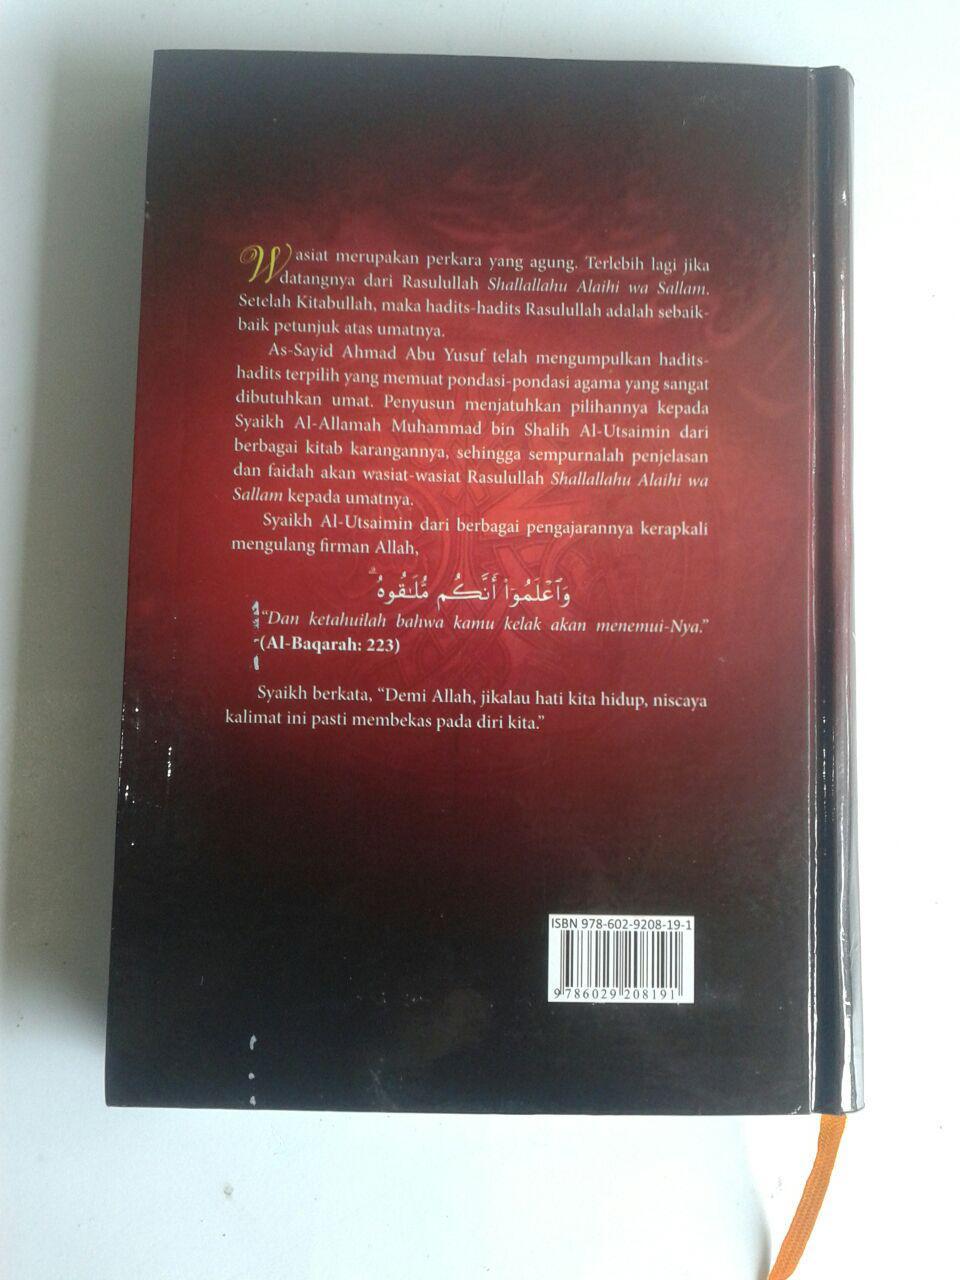 Buku Wasiat-Wasiat Rasulullah Kepada Umatnya cover 2